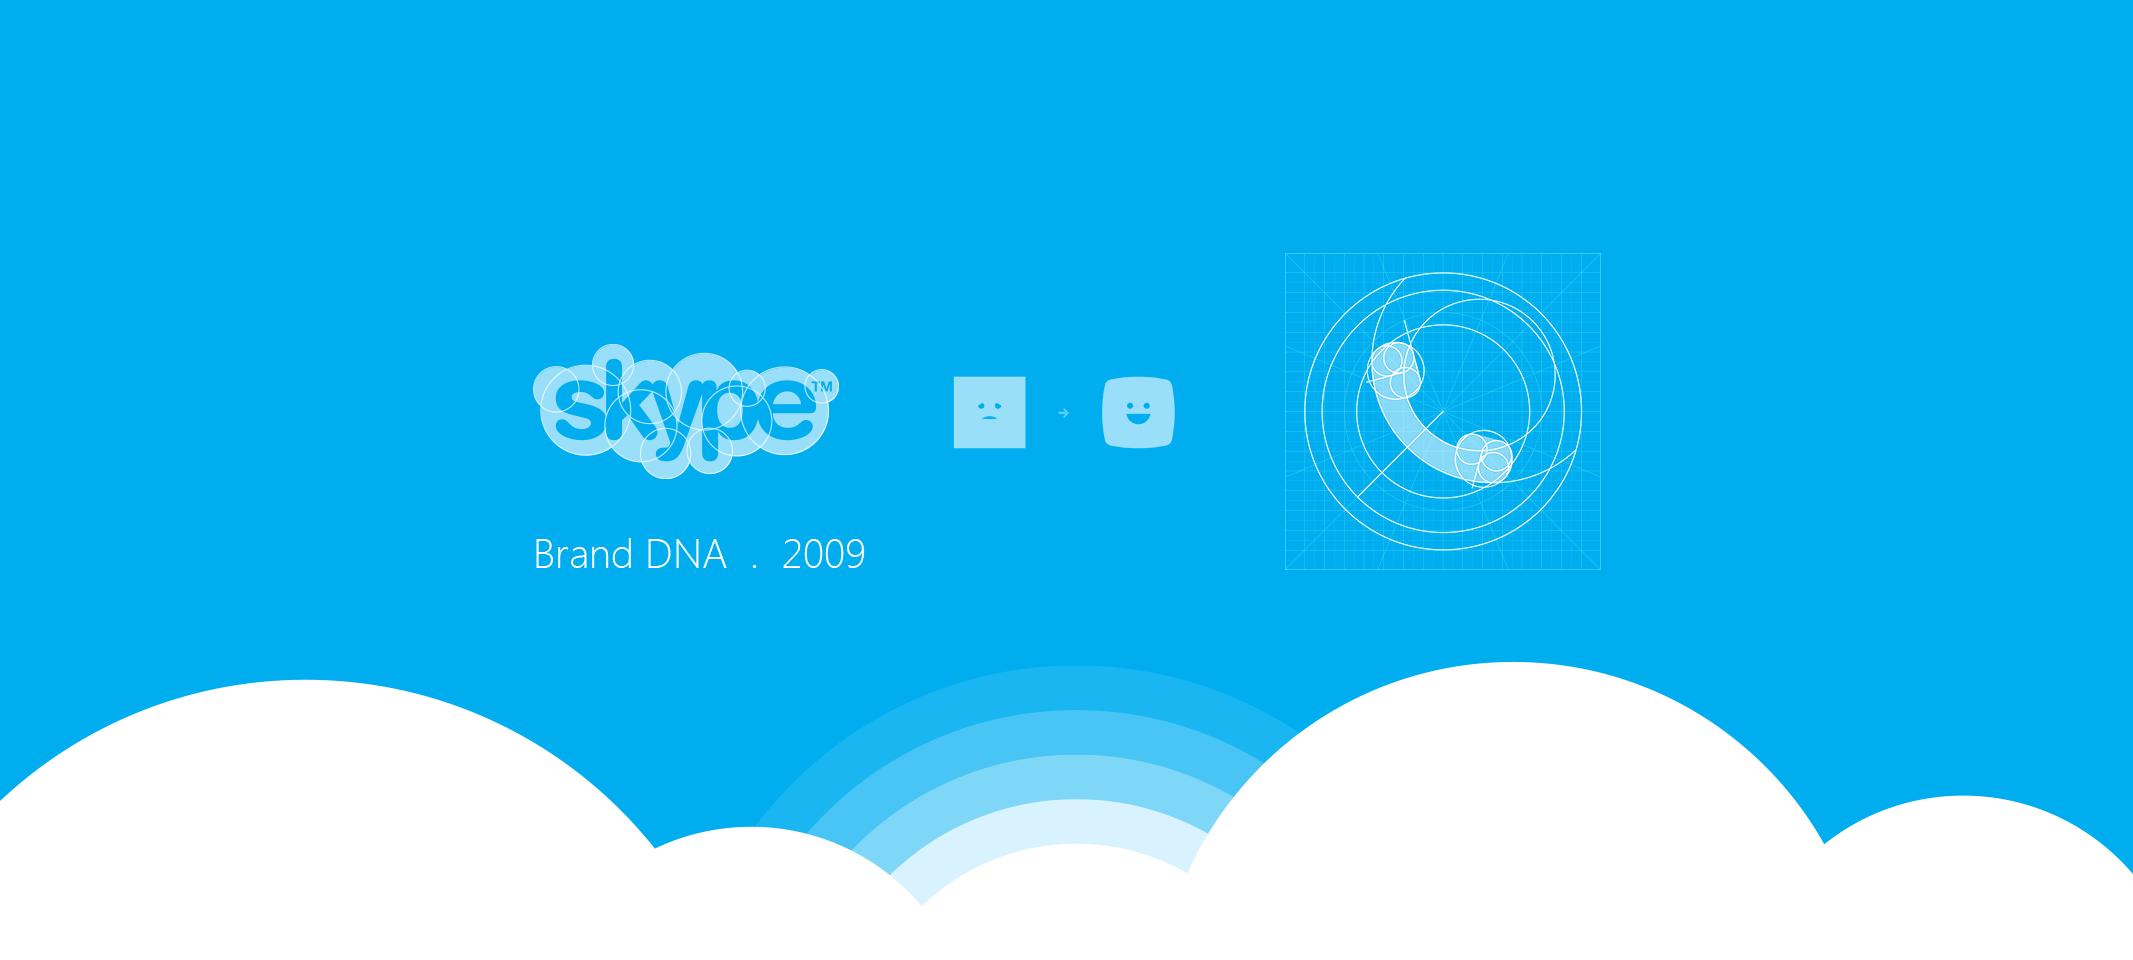 skype_dna.png